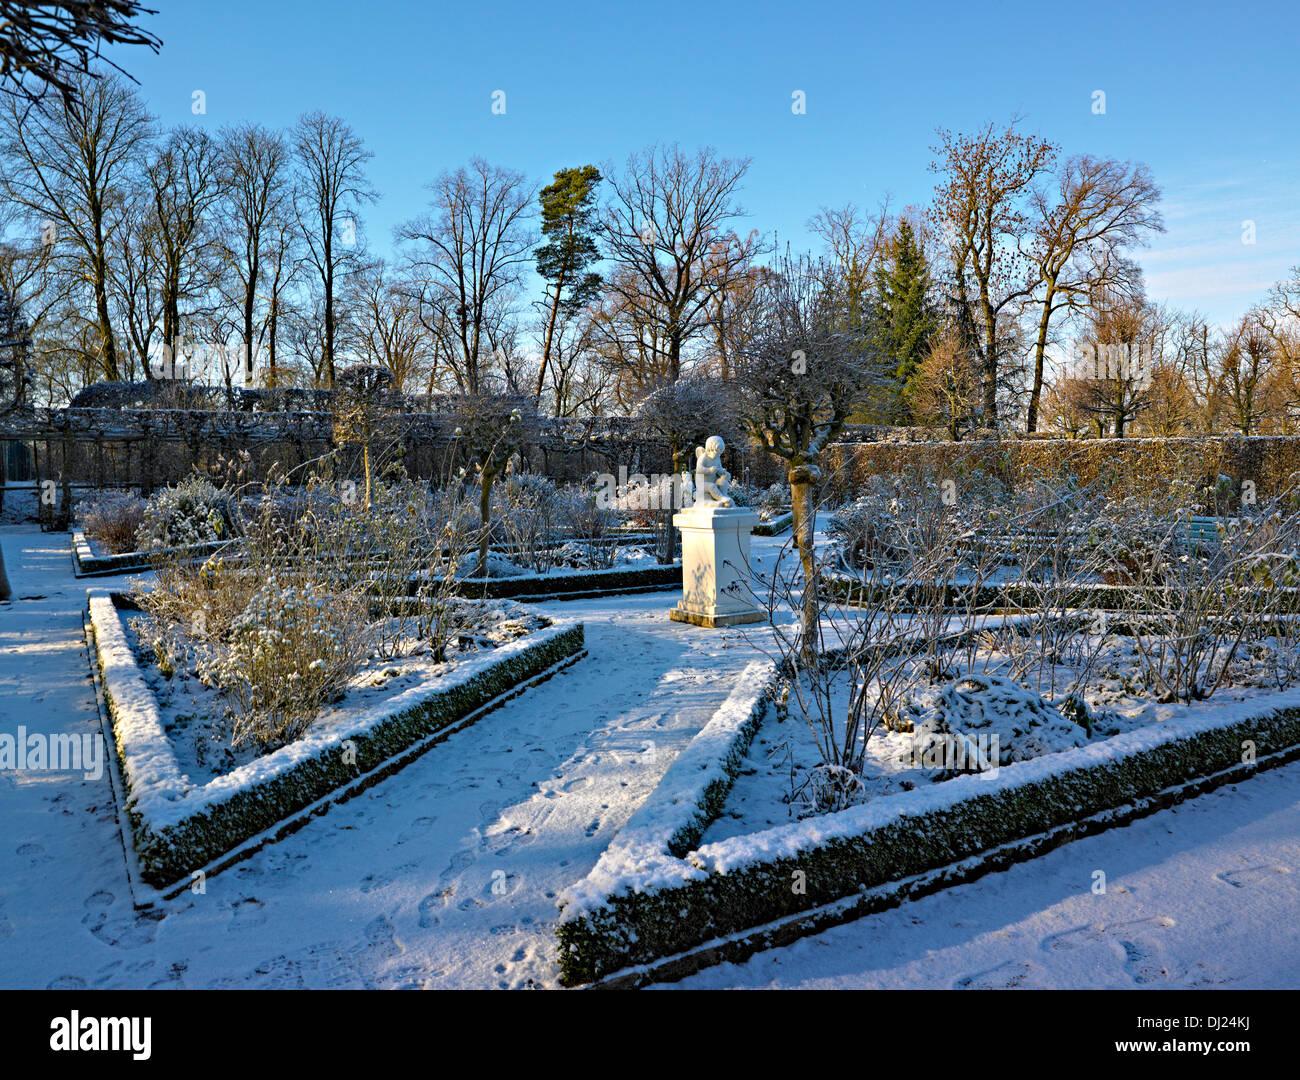 Amor jardín, castillo de Belvedere, Weimar, Turingia, Alemania Imagen De Stock